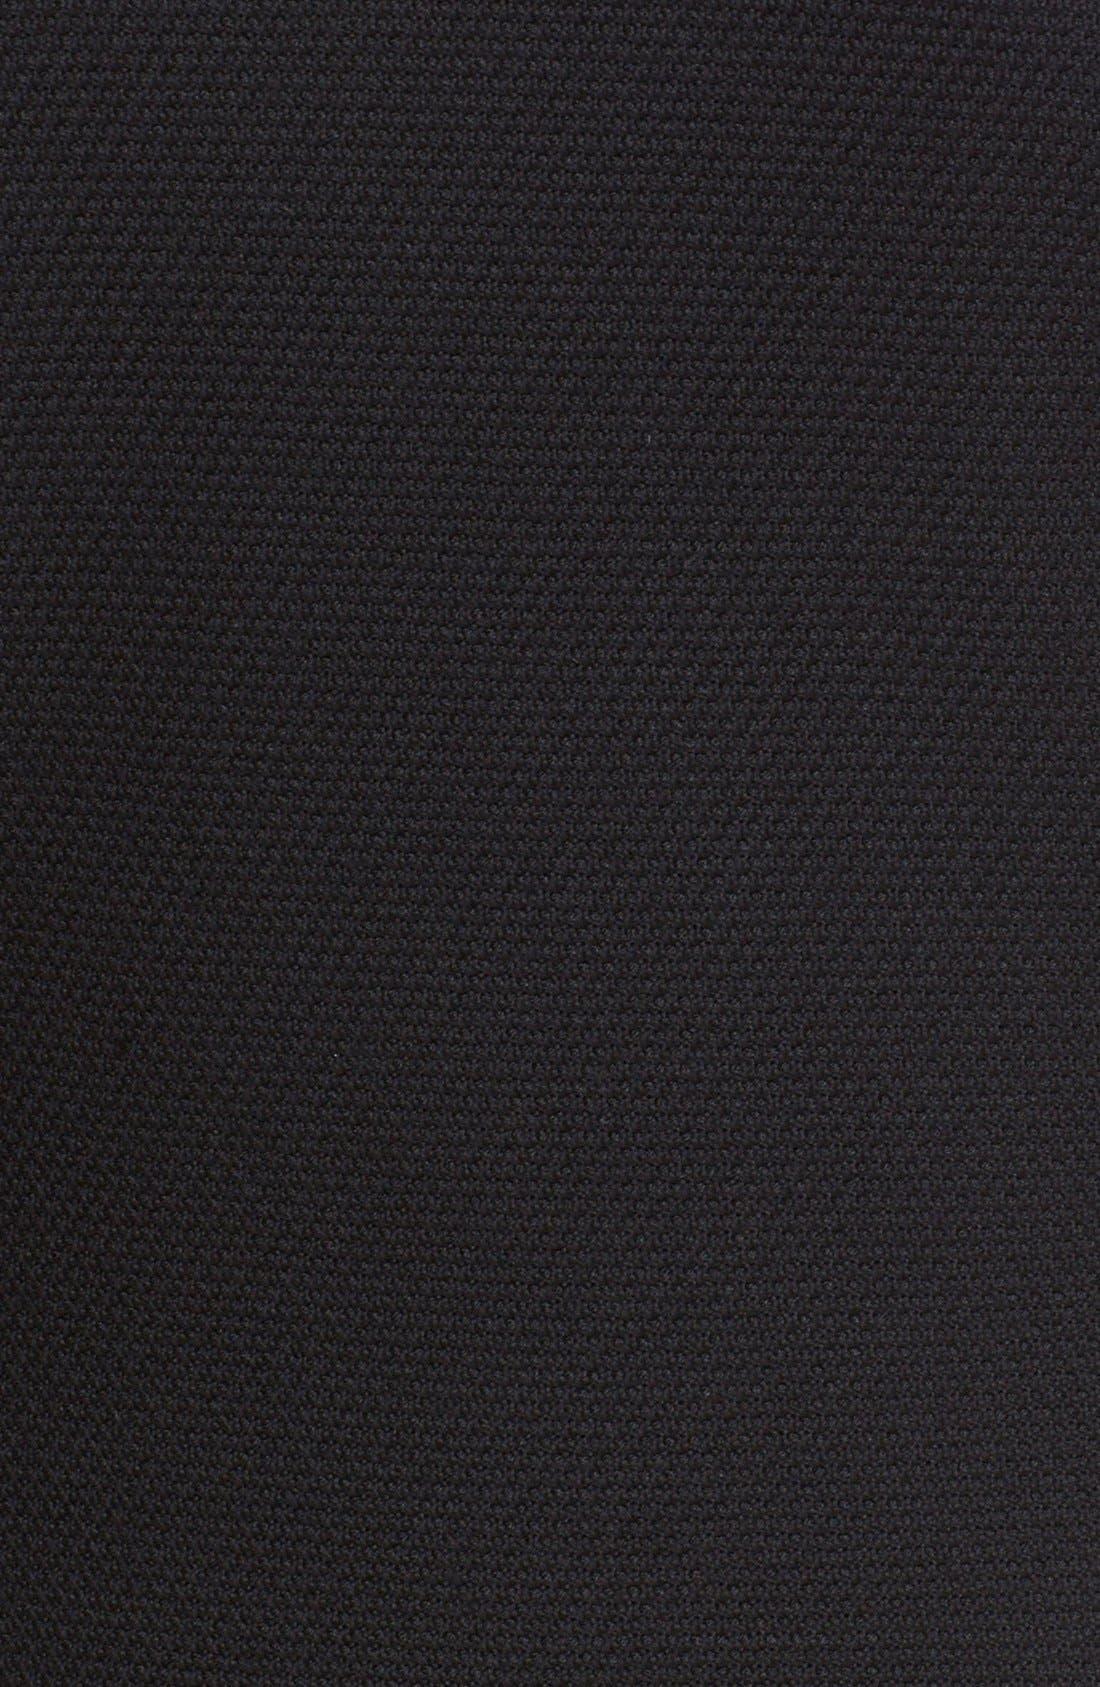 Alternate Image 3  - St. John Collection Micro Bouclé Knit Jackt